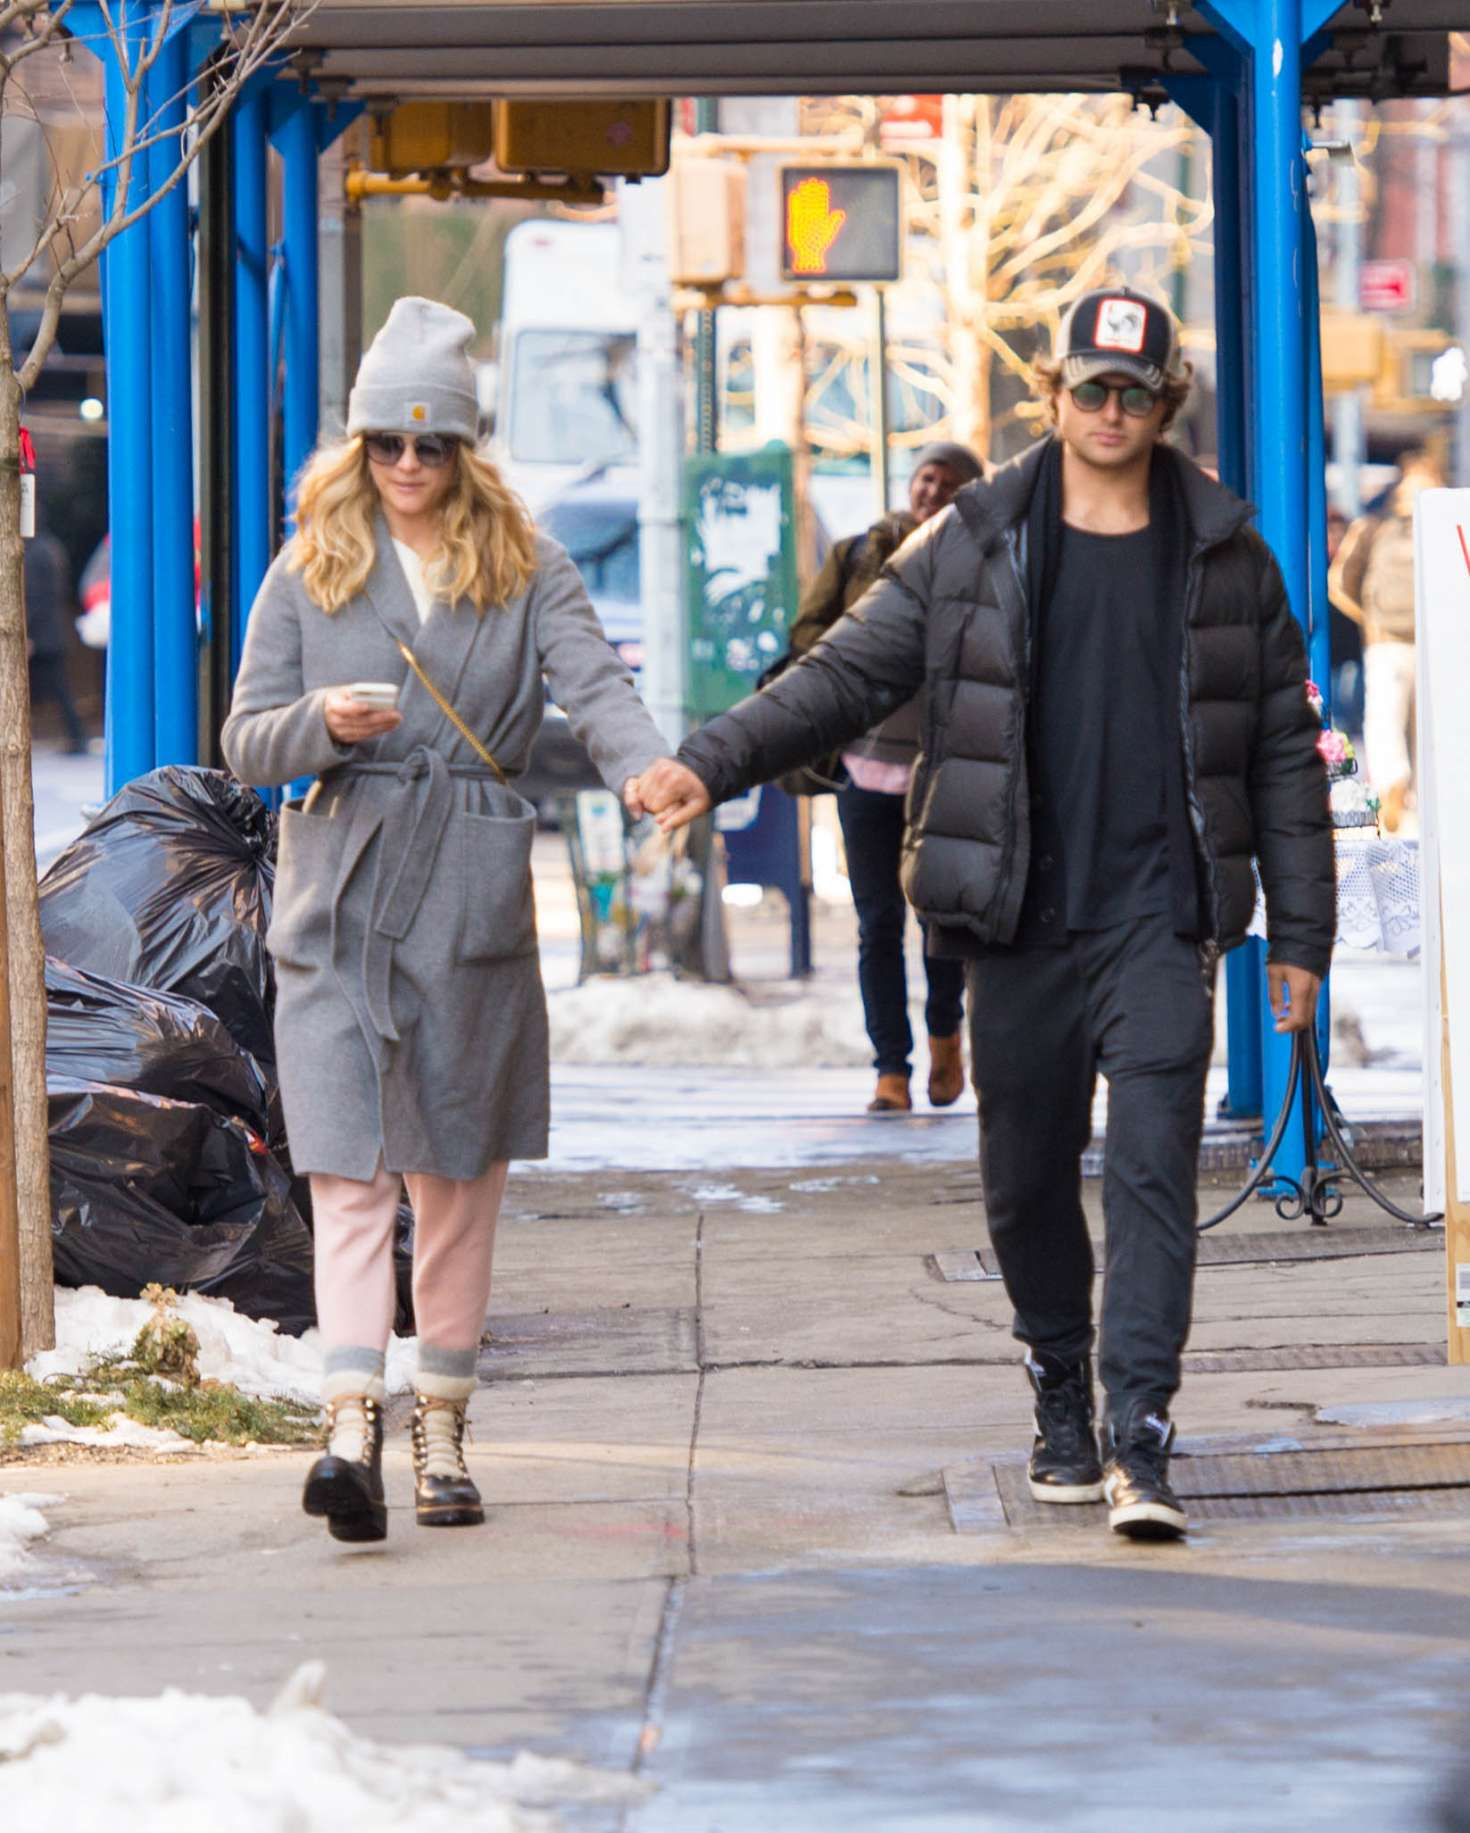 Nina Agdal 2018 : Nina Agdal: Shopping with boyfriend Jack Brinkley-Cook -12